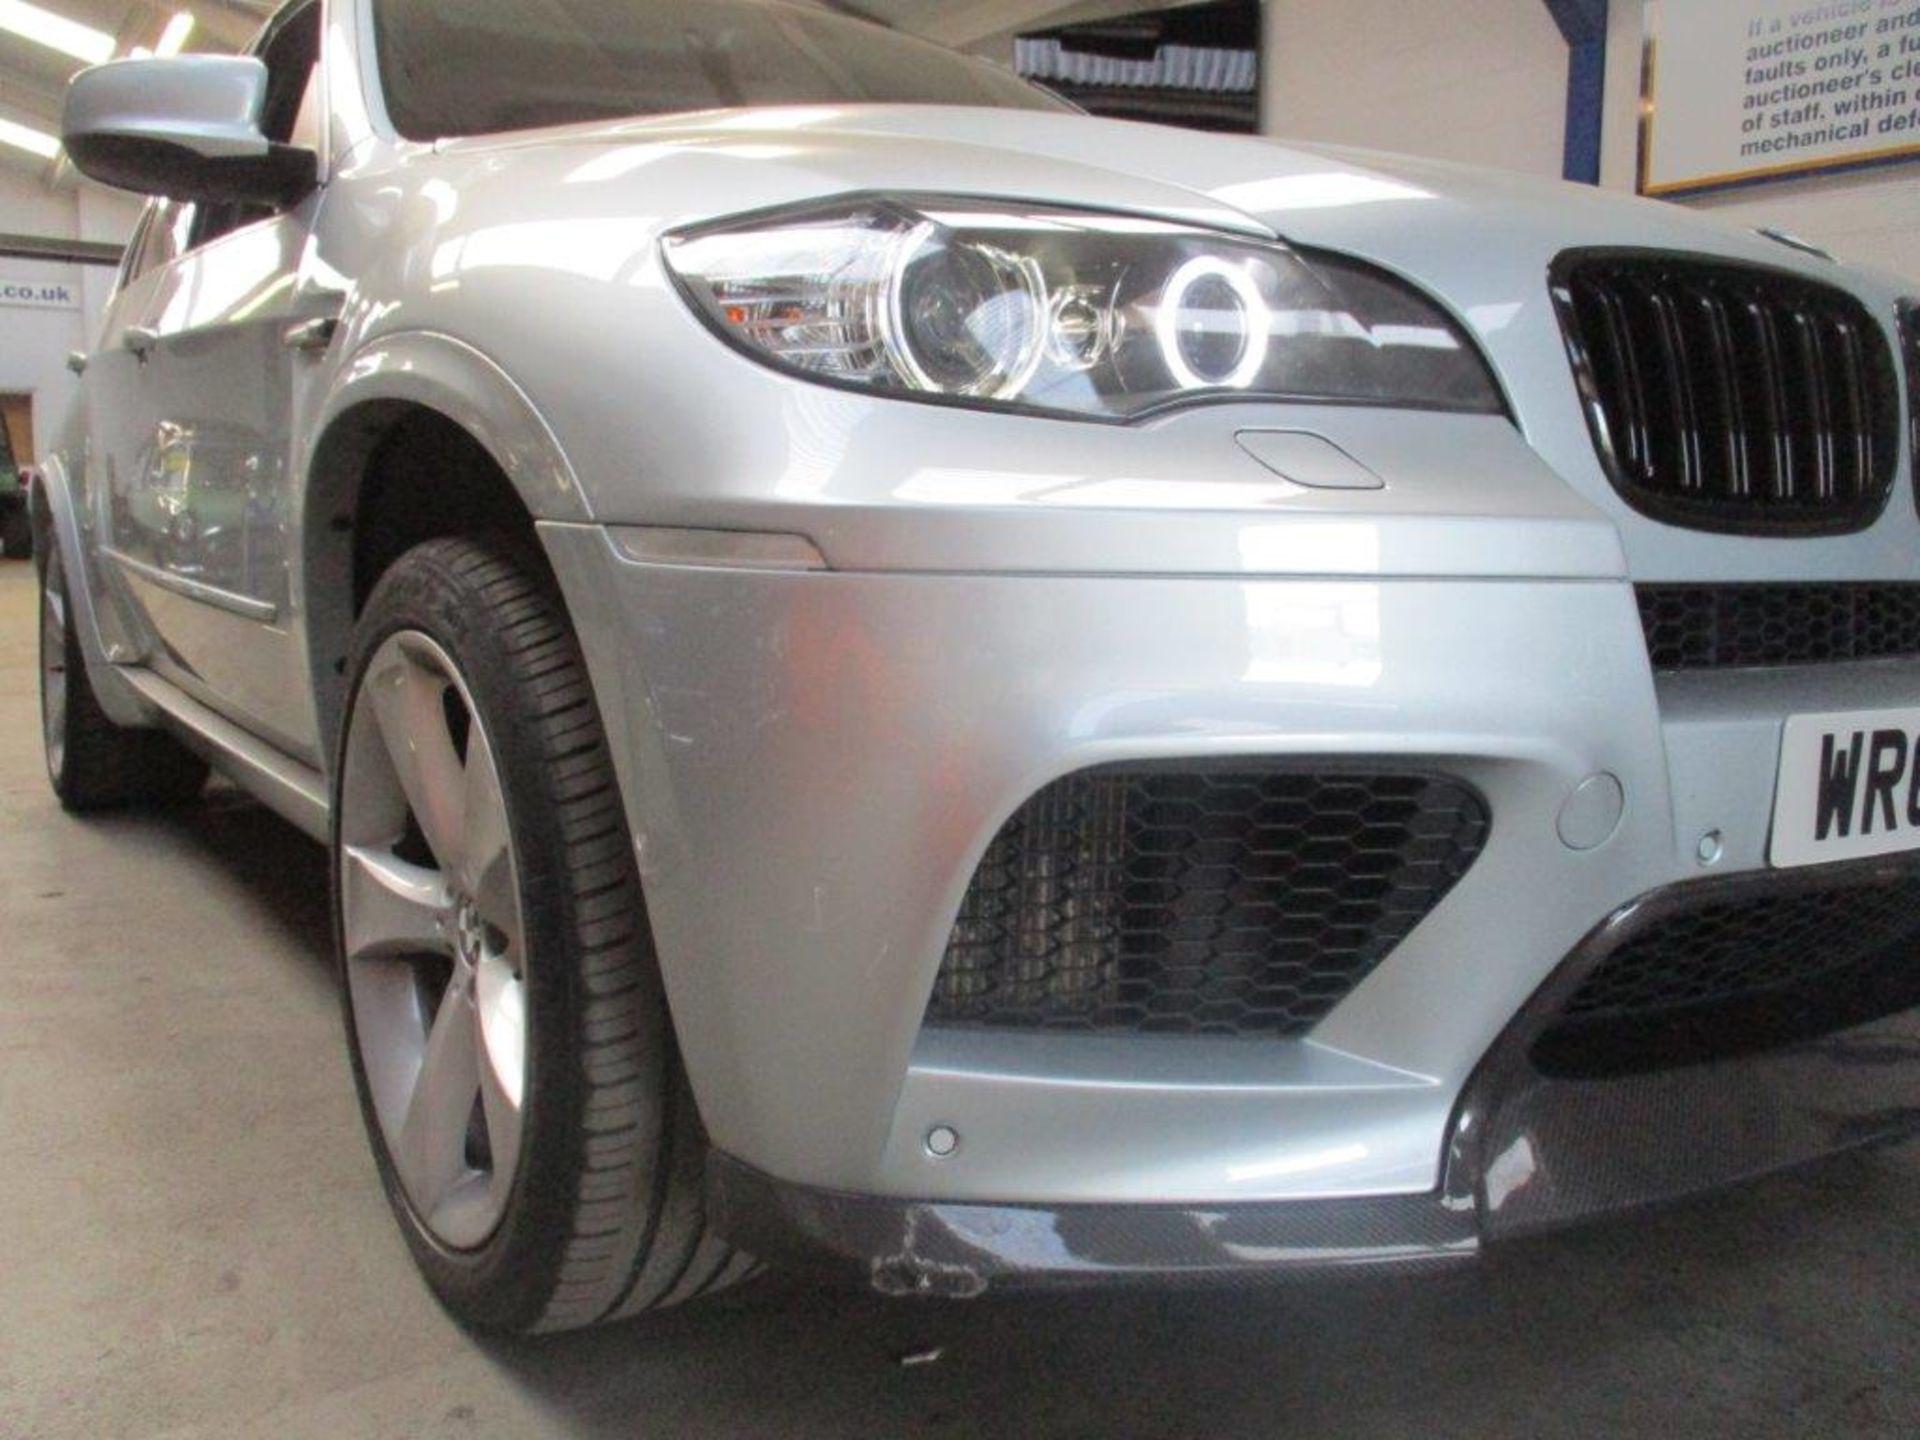 60 10 BMW X5 M Turbo Auto - Image 35 of 35